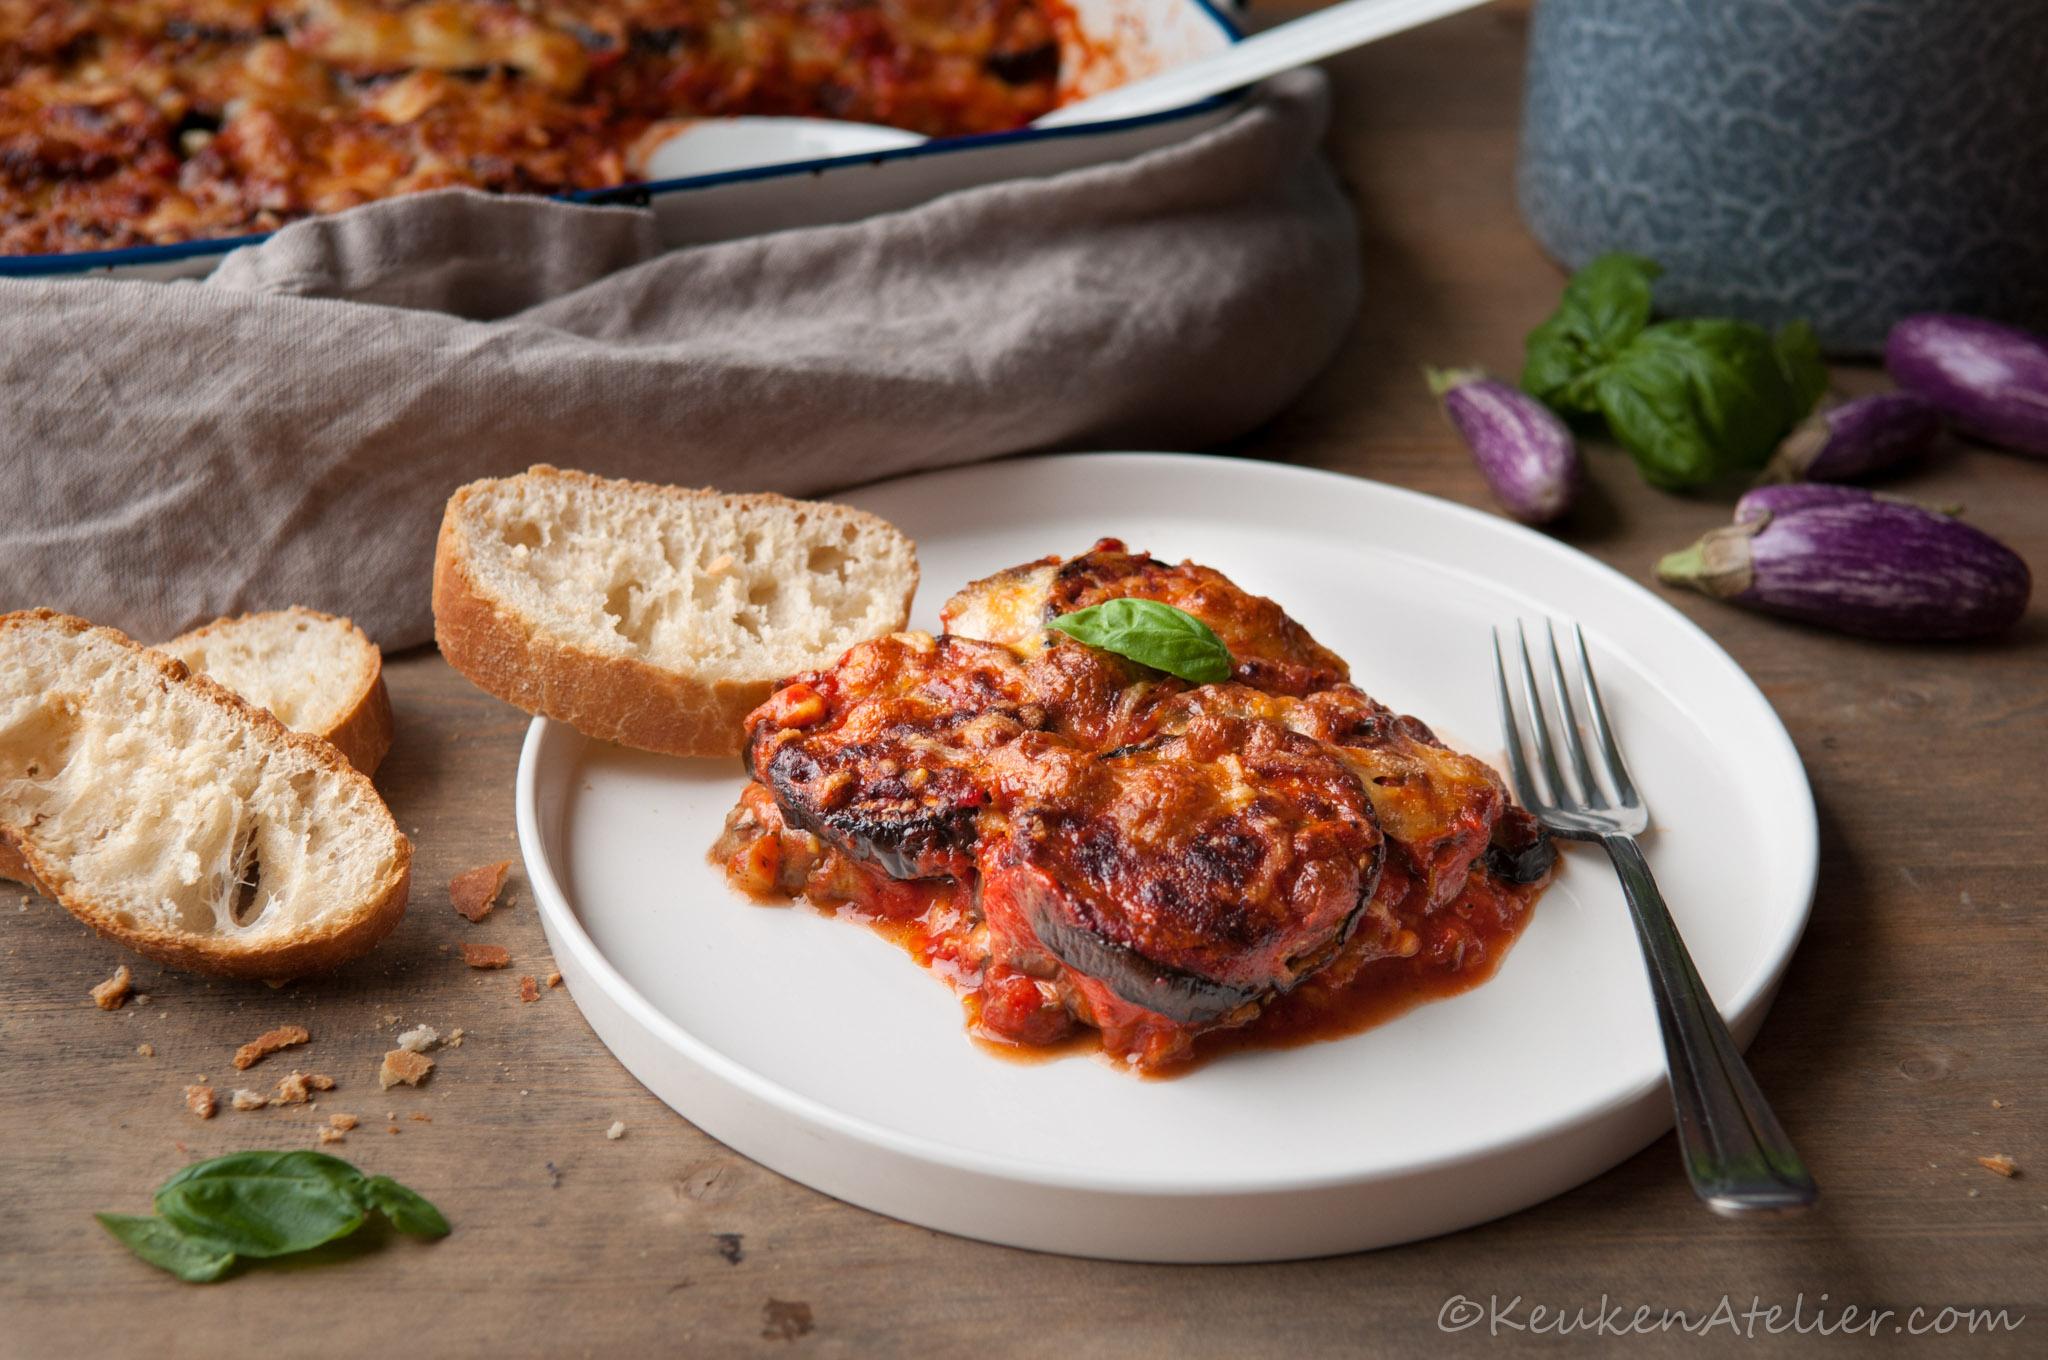 aubergine lasagne 2 keukenatelier.com